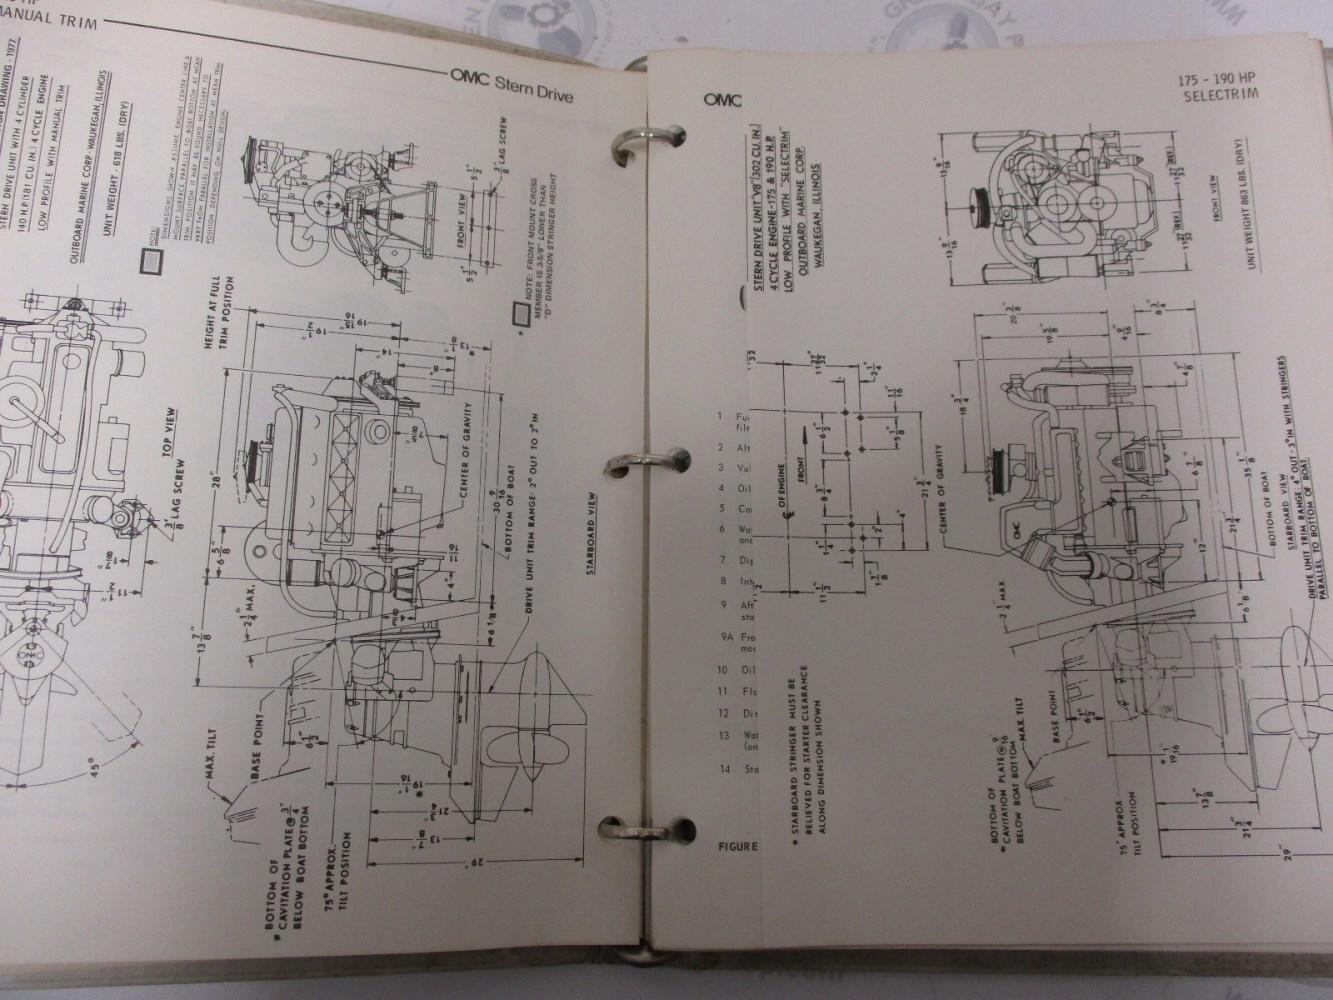 medium resolution of  981046 omc stern drive 1976 service installation manual